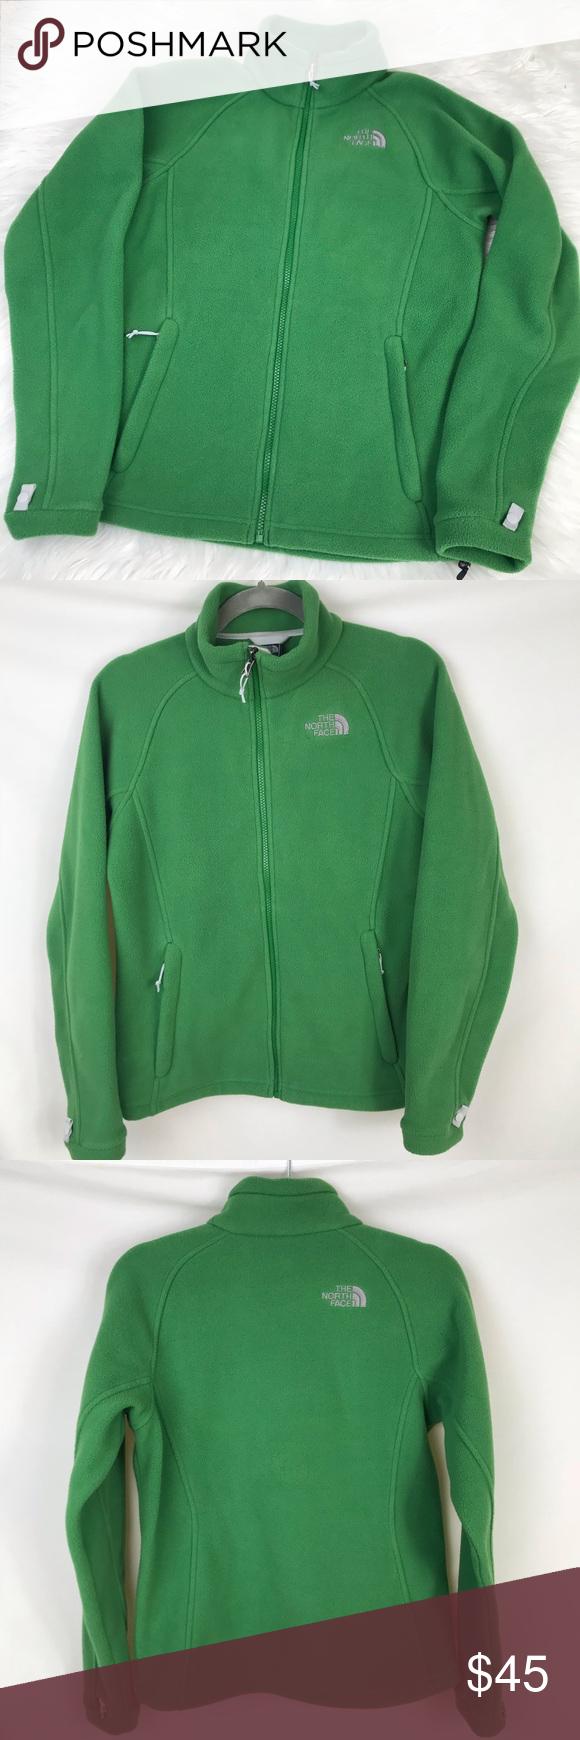 450d67561 The North Face Khumbu Fleece Jacket Full Zip Green The North Face ...